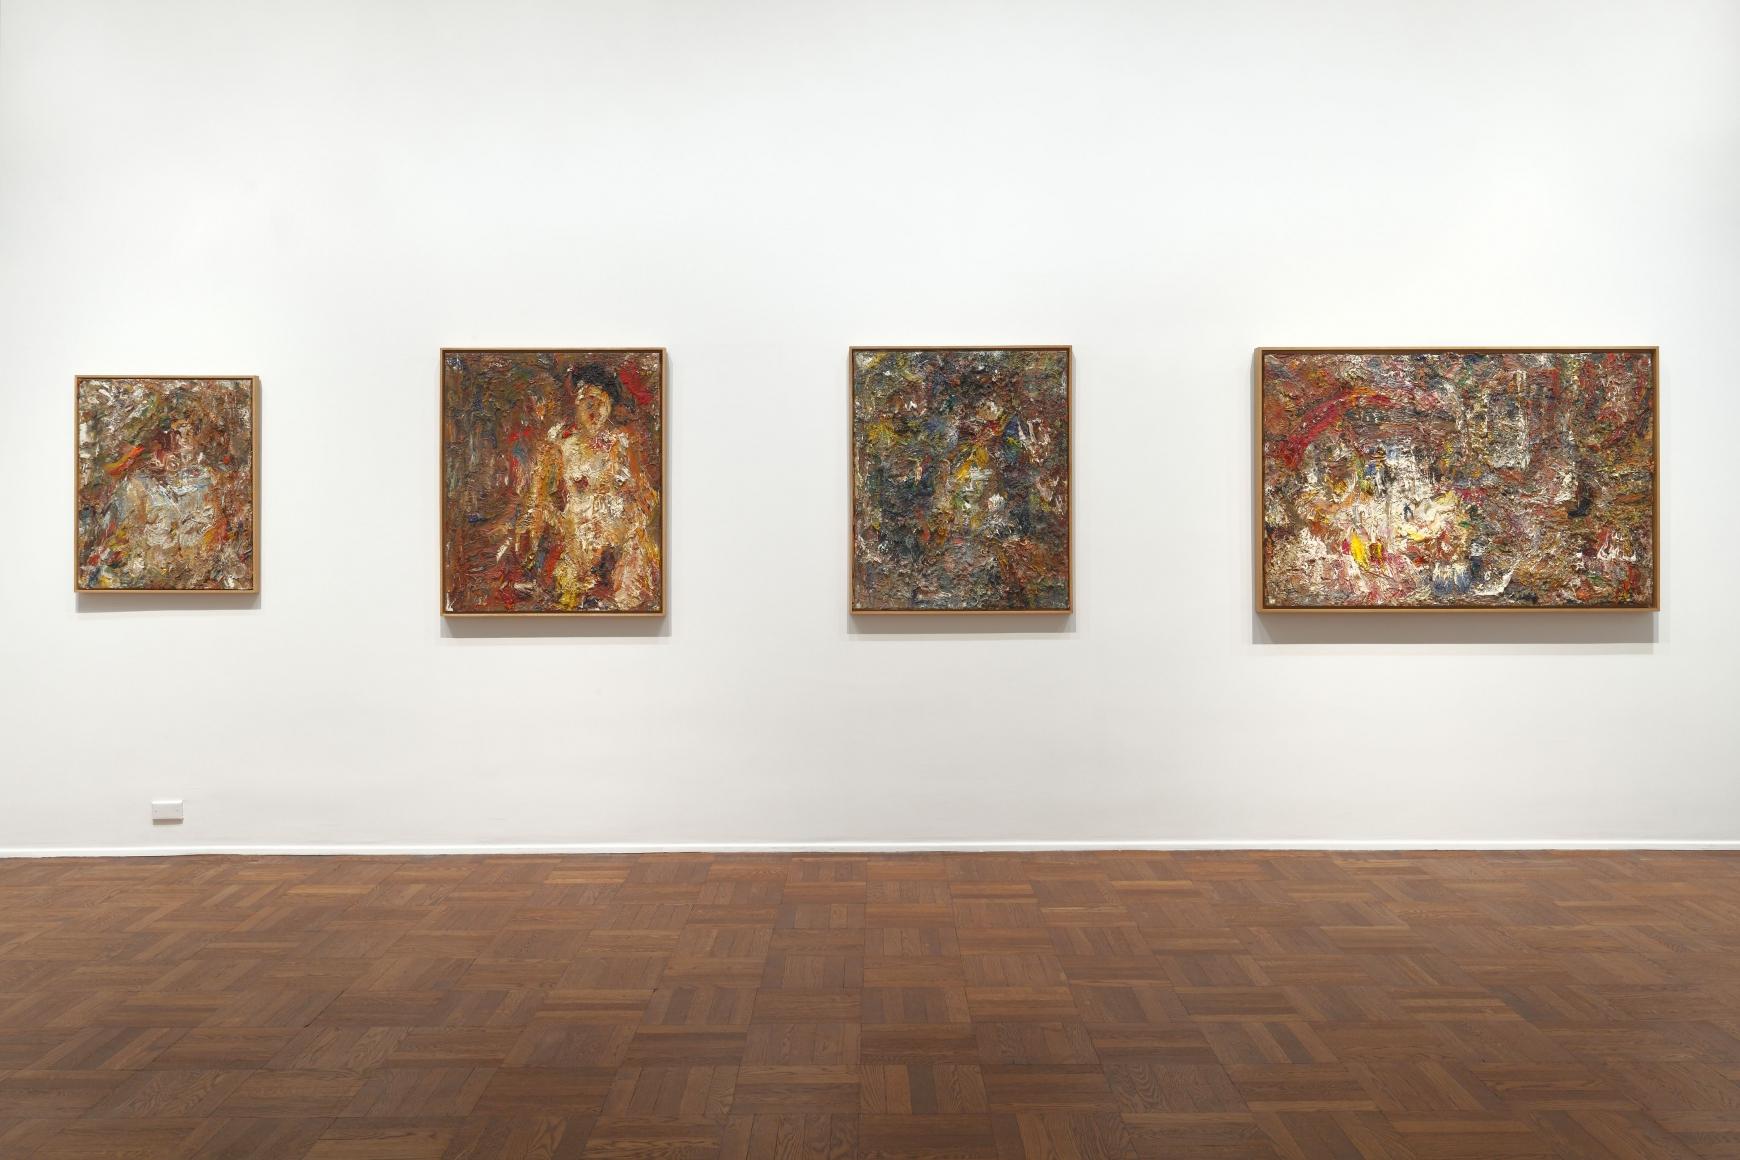 EUGÈNE LEROY, Nudes, New York, 2012, Installation Image 7